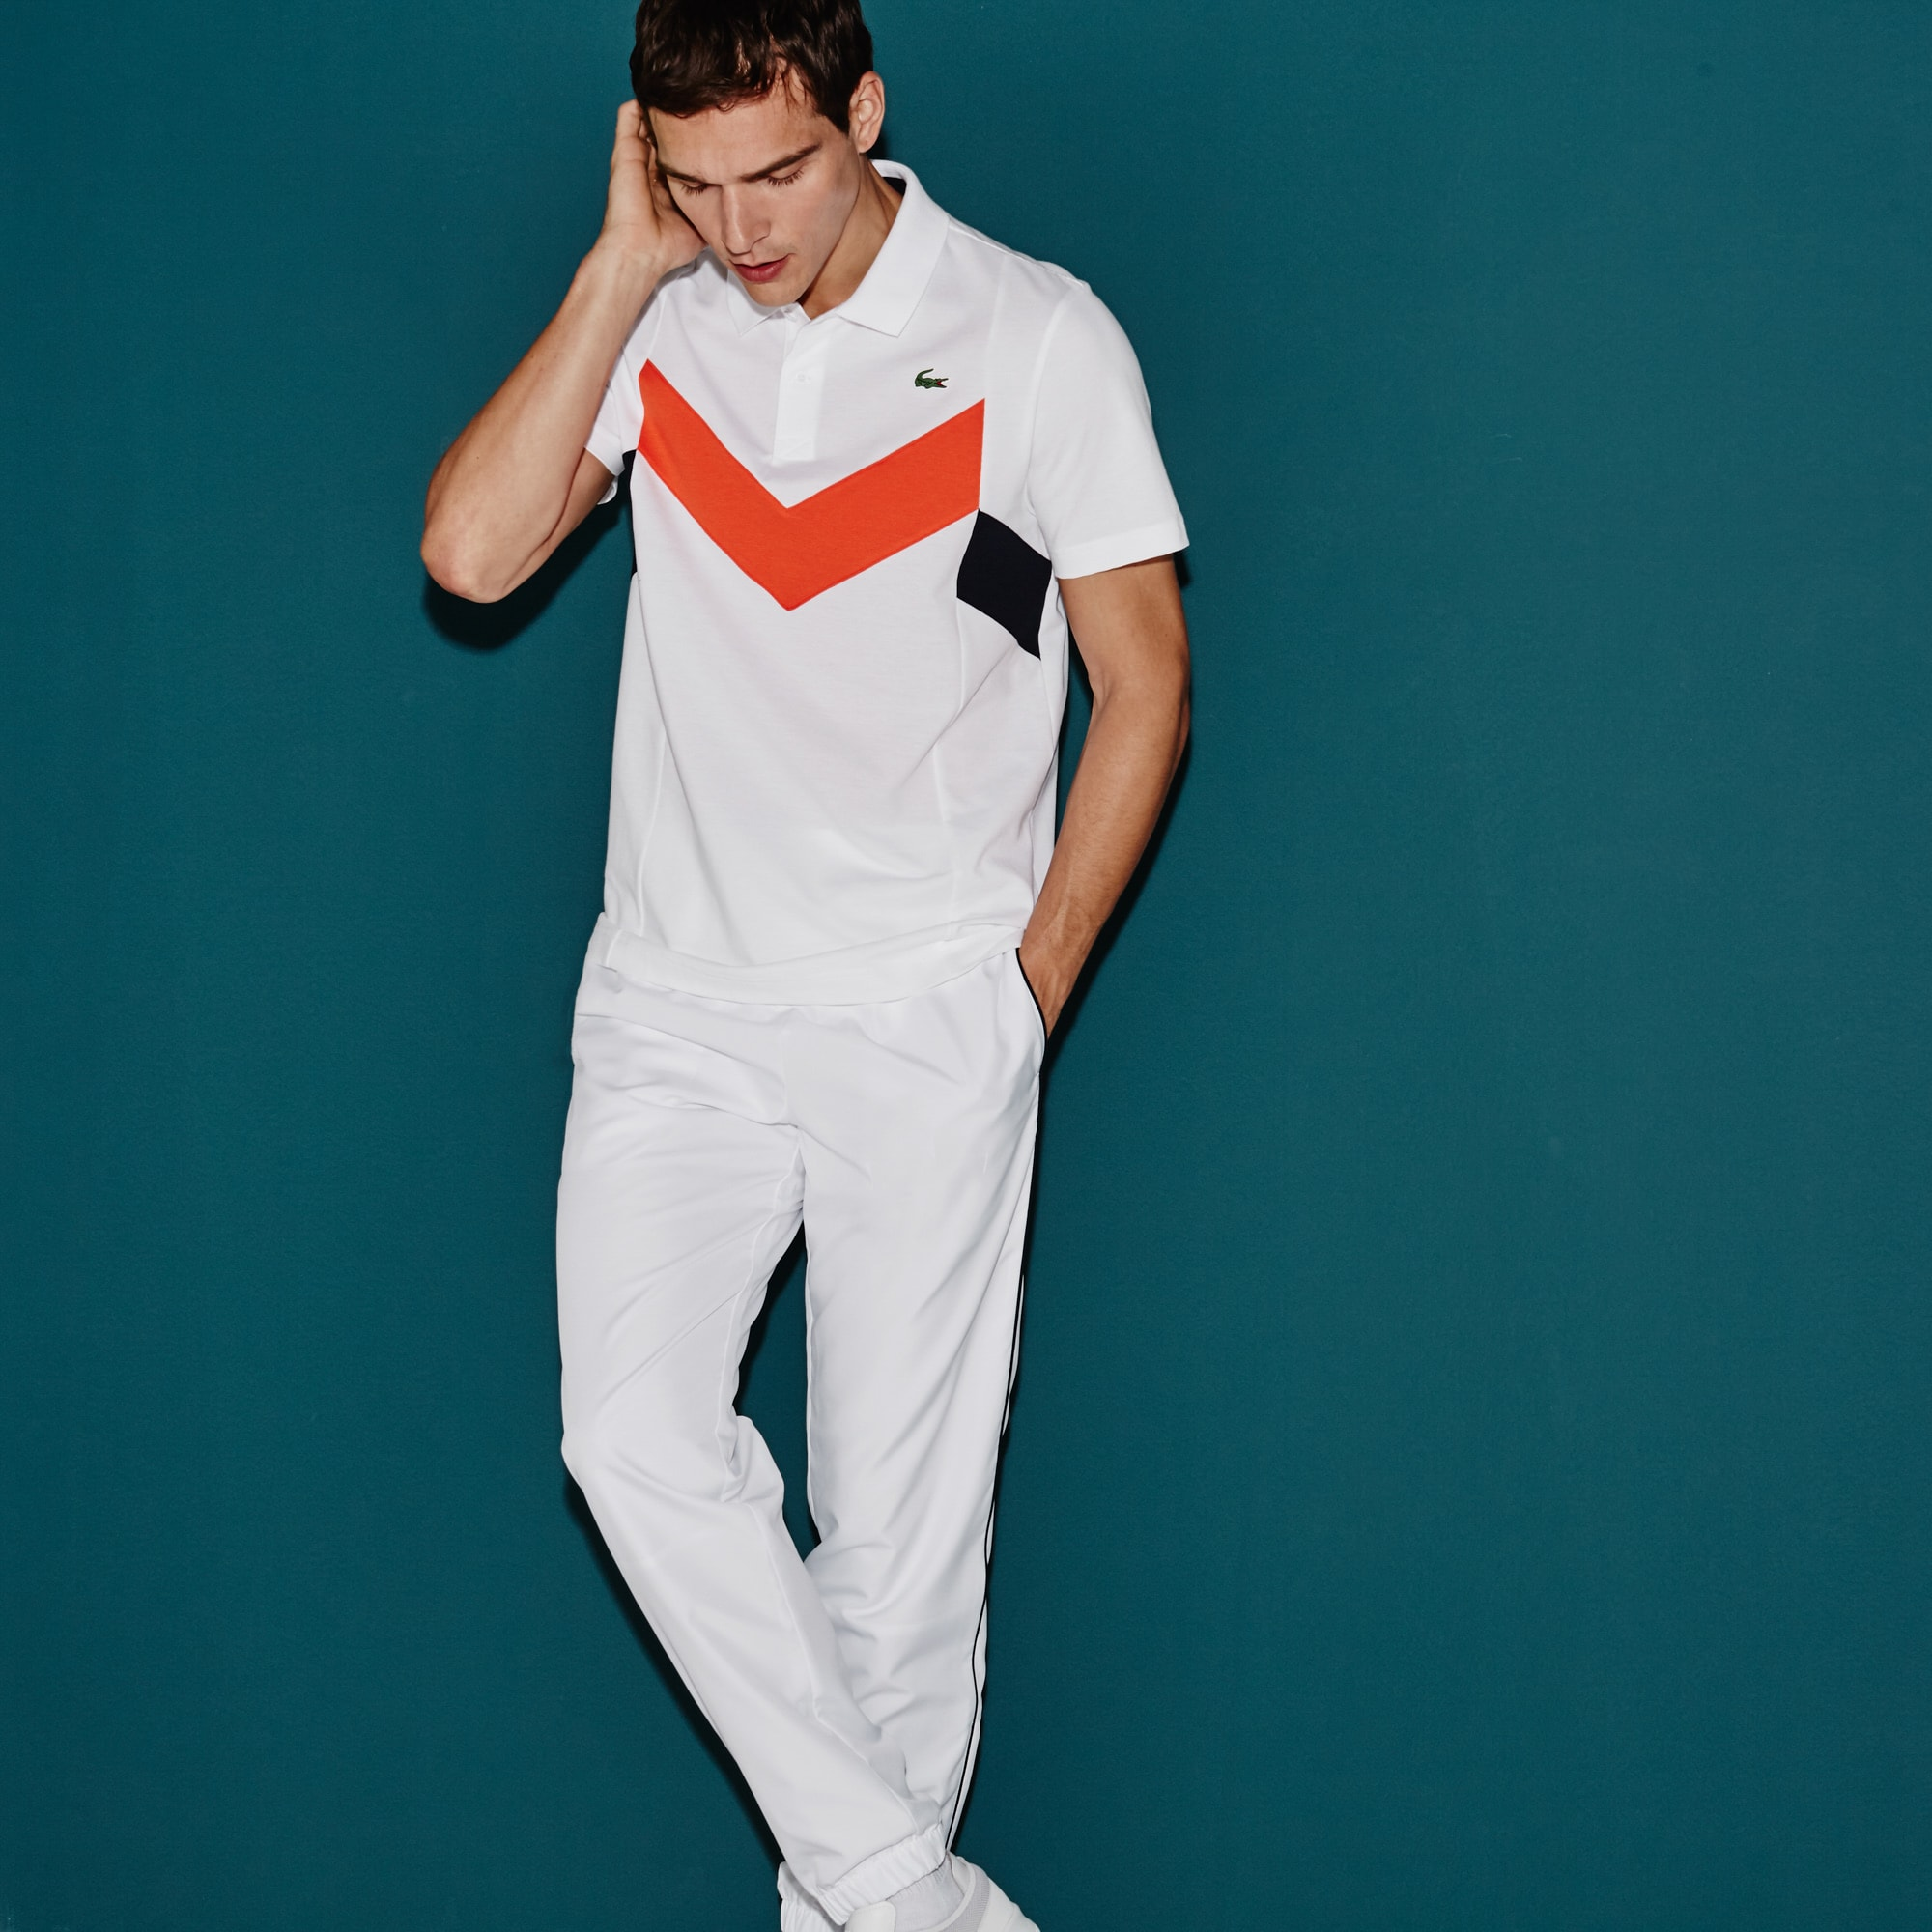 Men's SPORT Tennis Ultra-Lightweight Colorblock Knit Polo